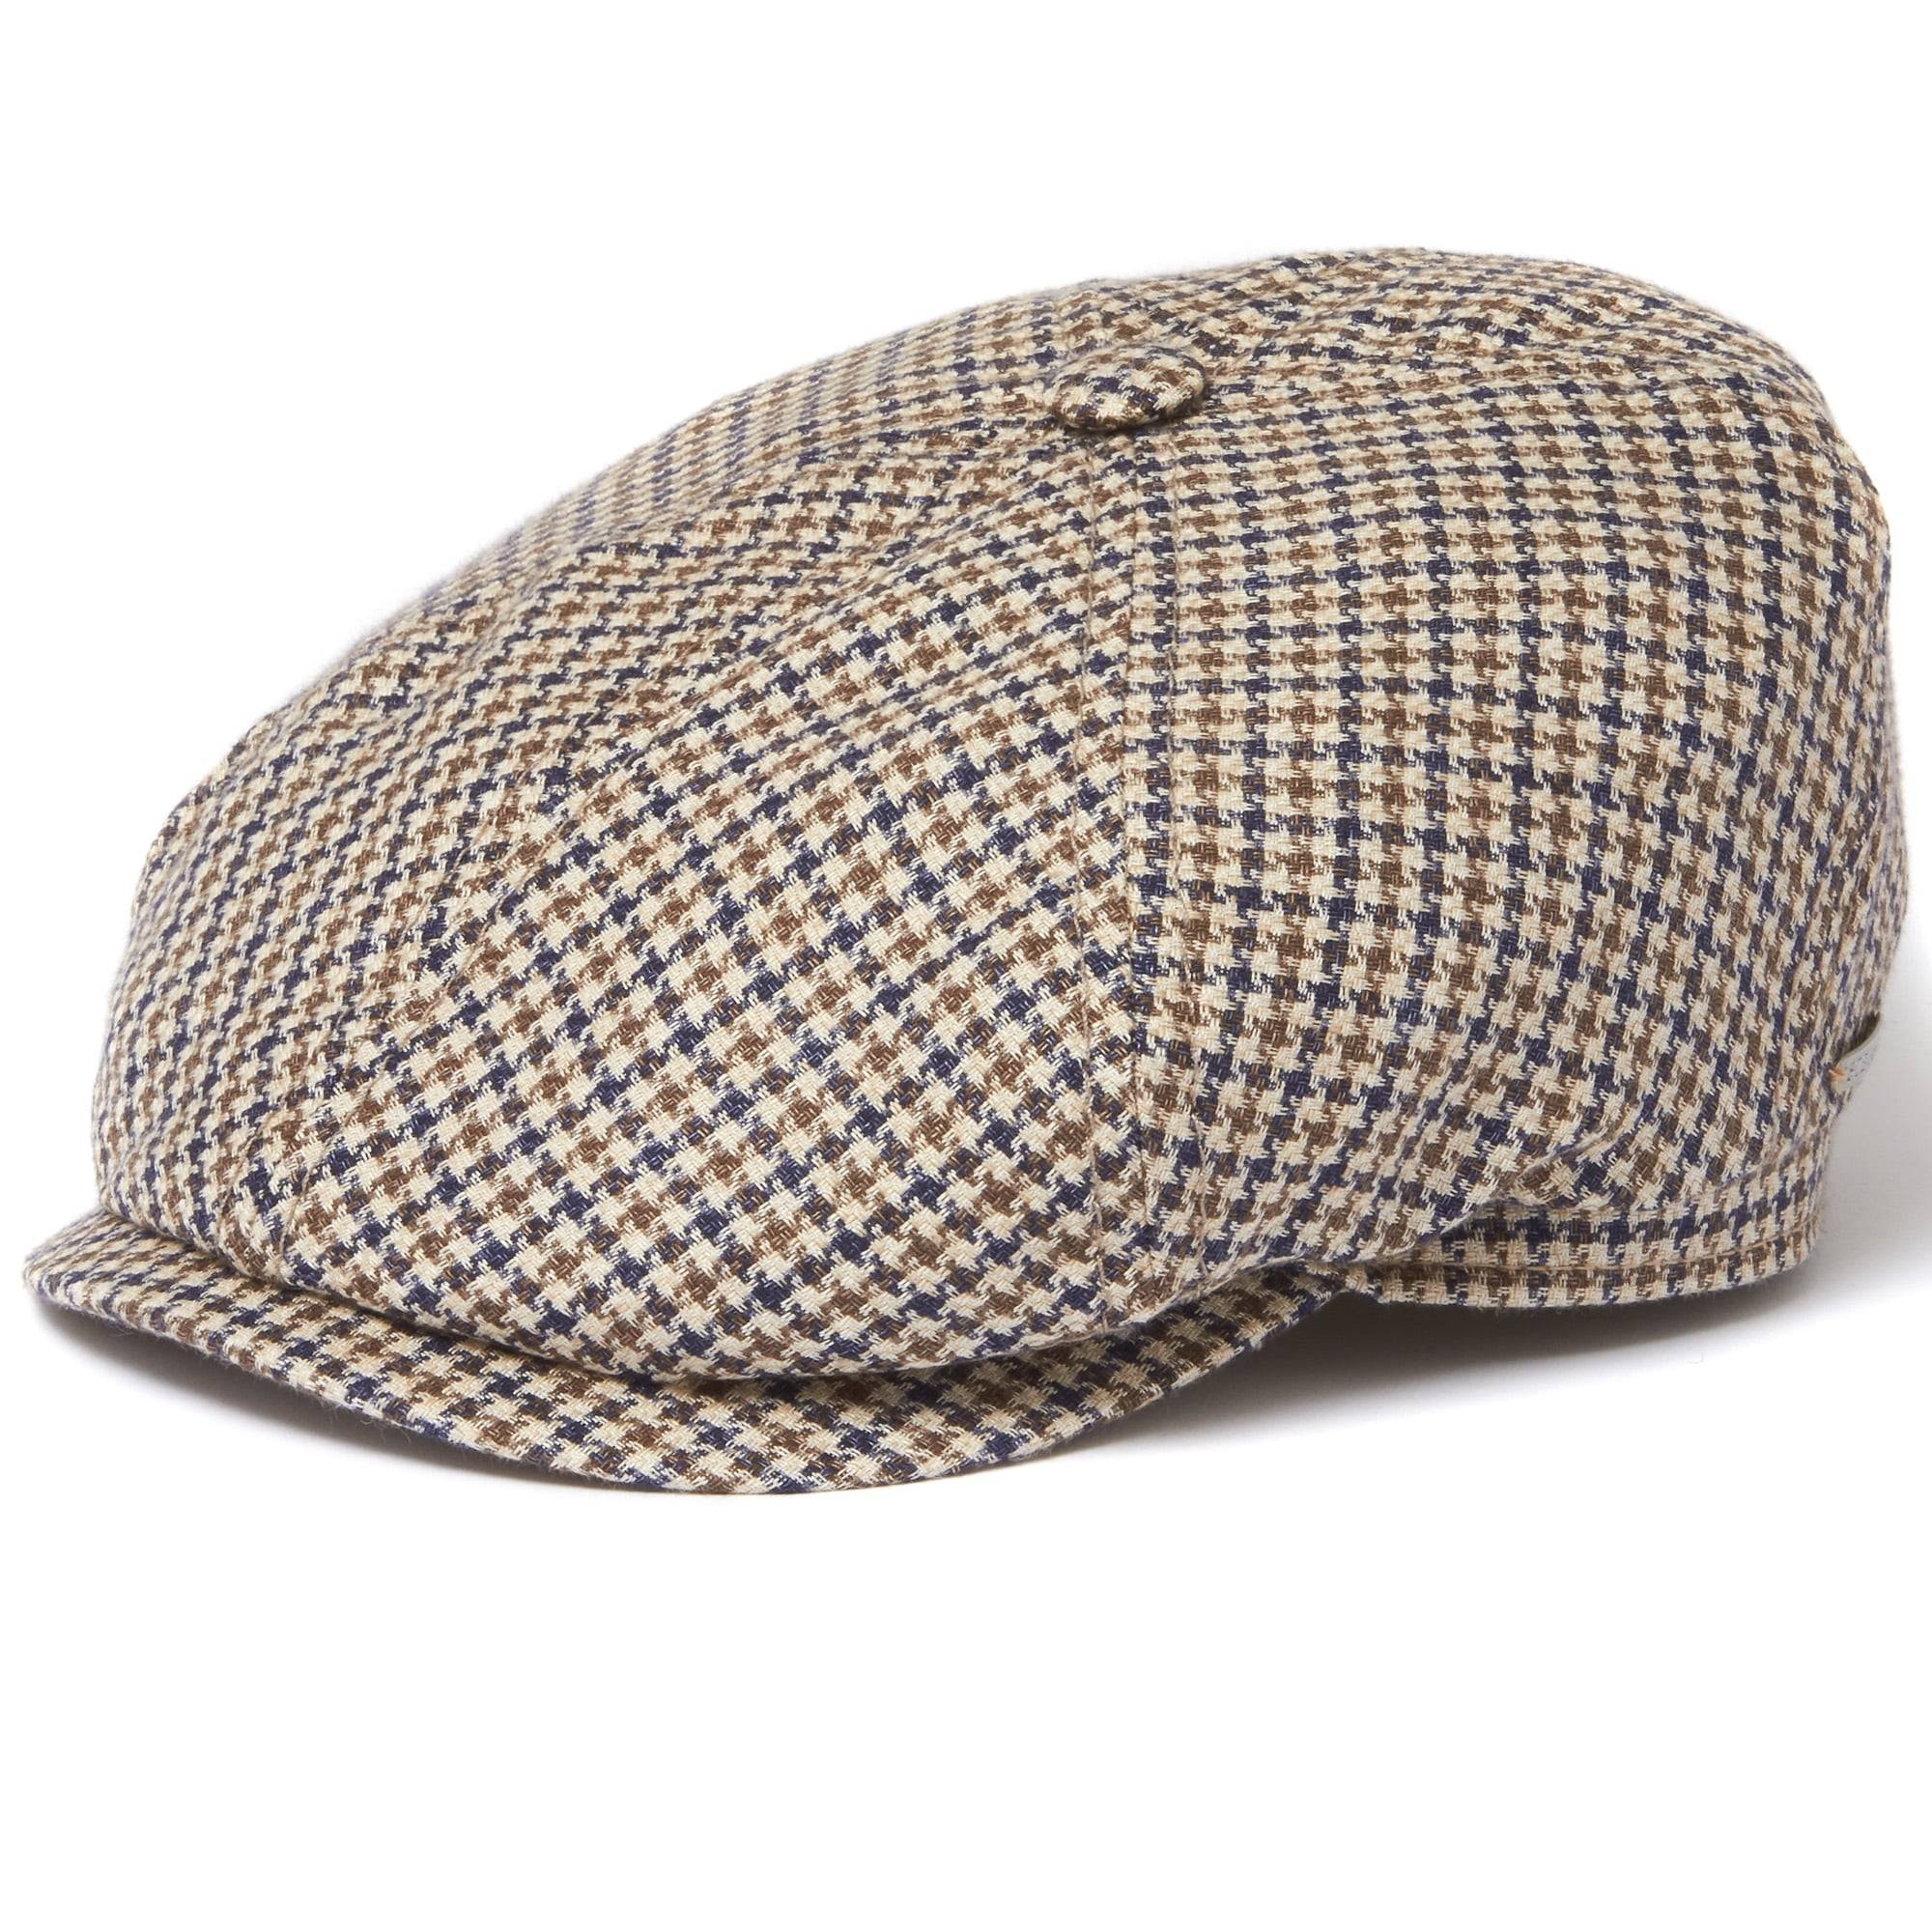 Stetson Hats Stetson Houndstooth Narrow Check 6-Panel Flat Cap 6643203152